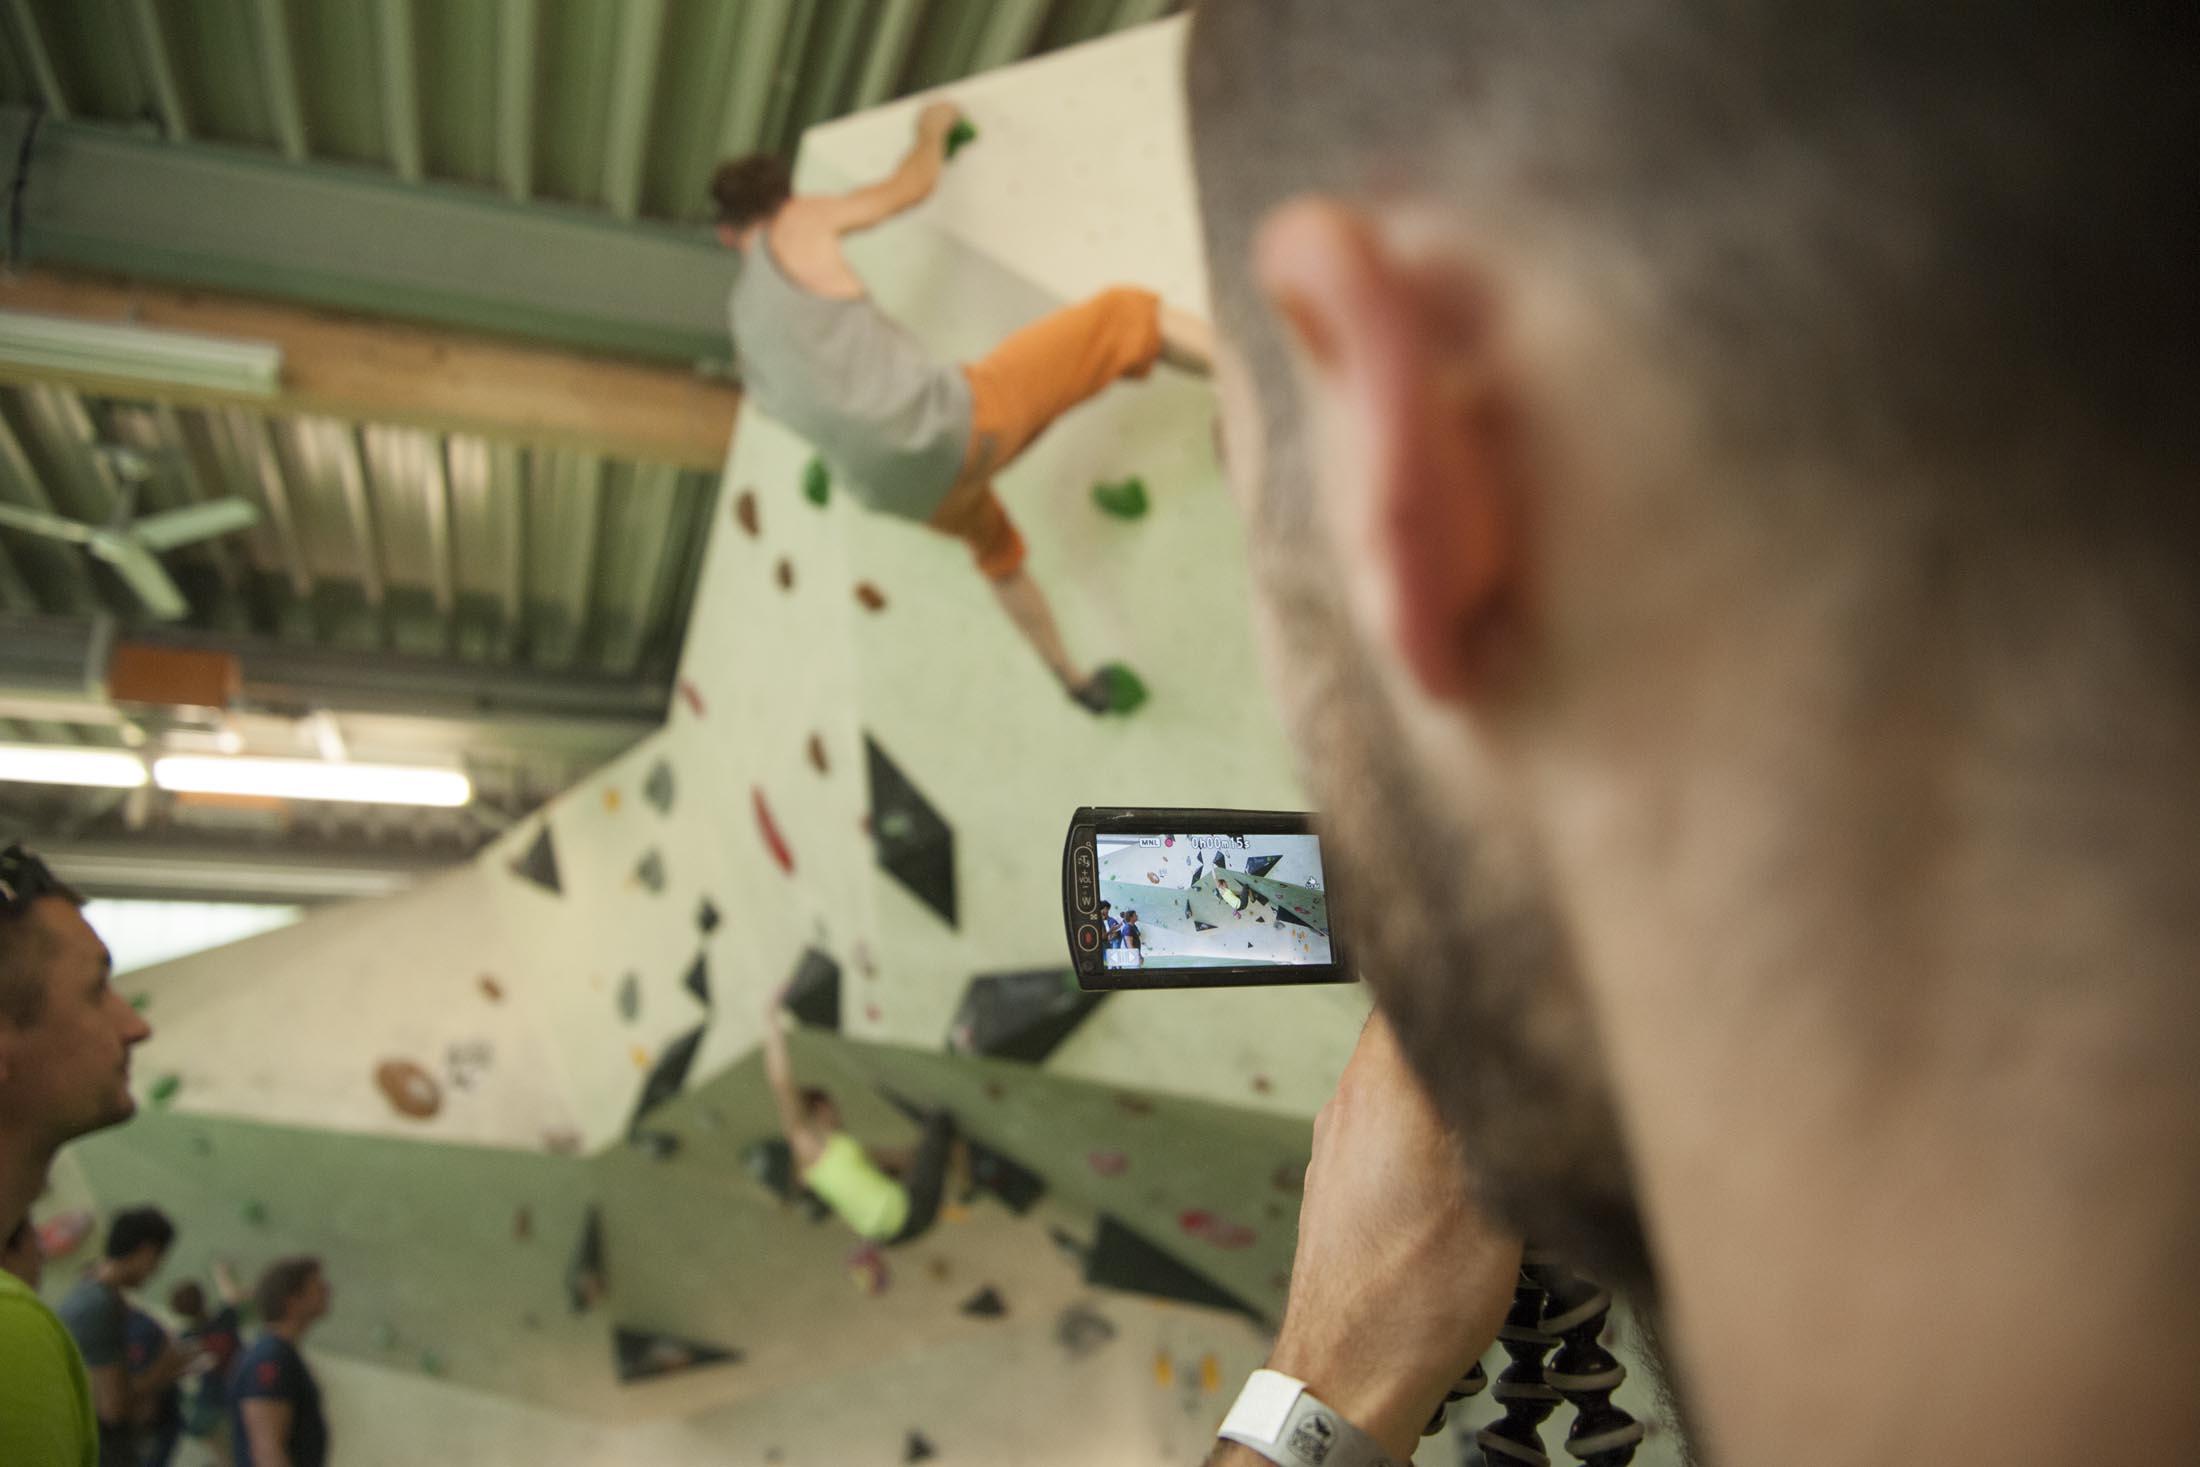 Quali, internationaler bouldercup Frankenjura 2016, BLOCKHELDEN Erlangen, Mammut, Bergfreunde.de, Boulderwettkampf07092016181